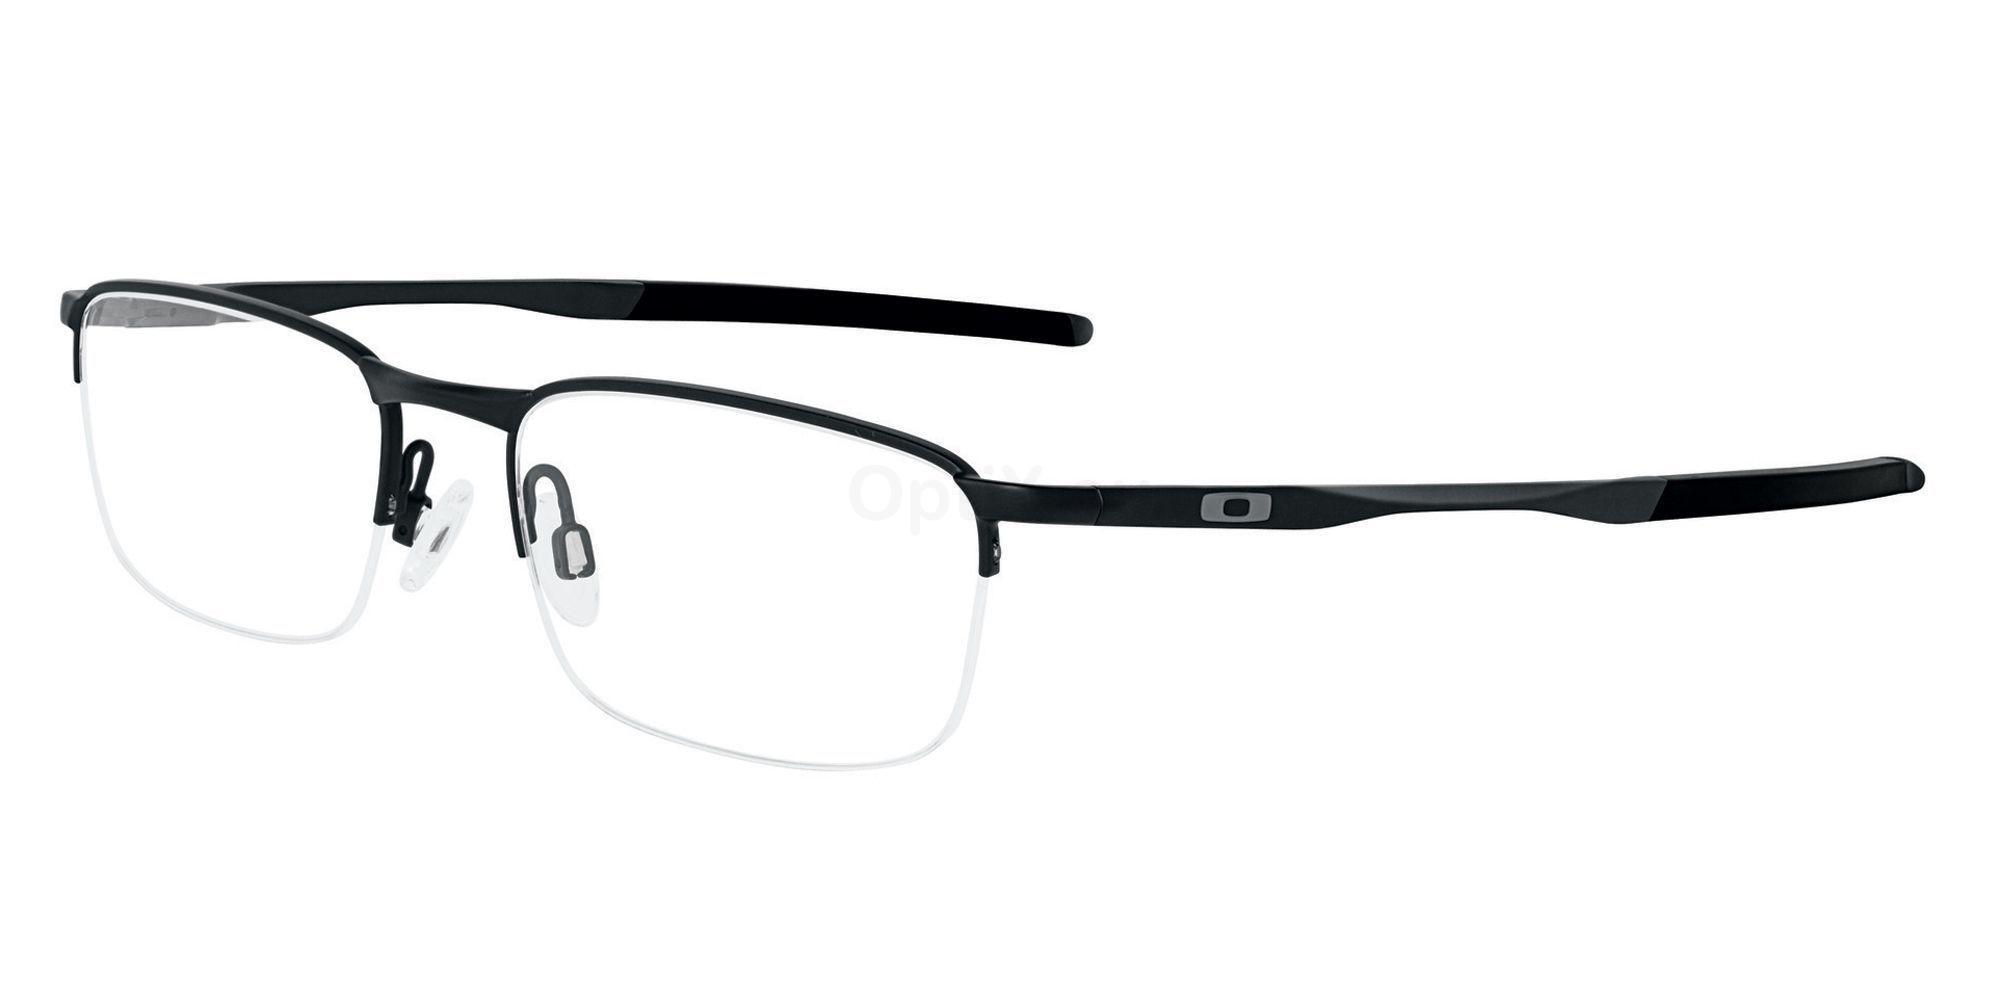 317401 OX3174 BARRELHOUSE 0.5 Glasses, Oakley